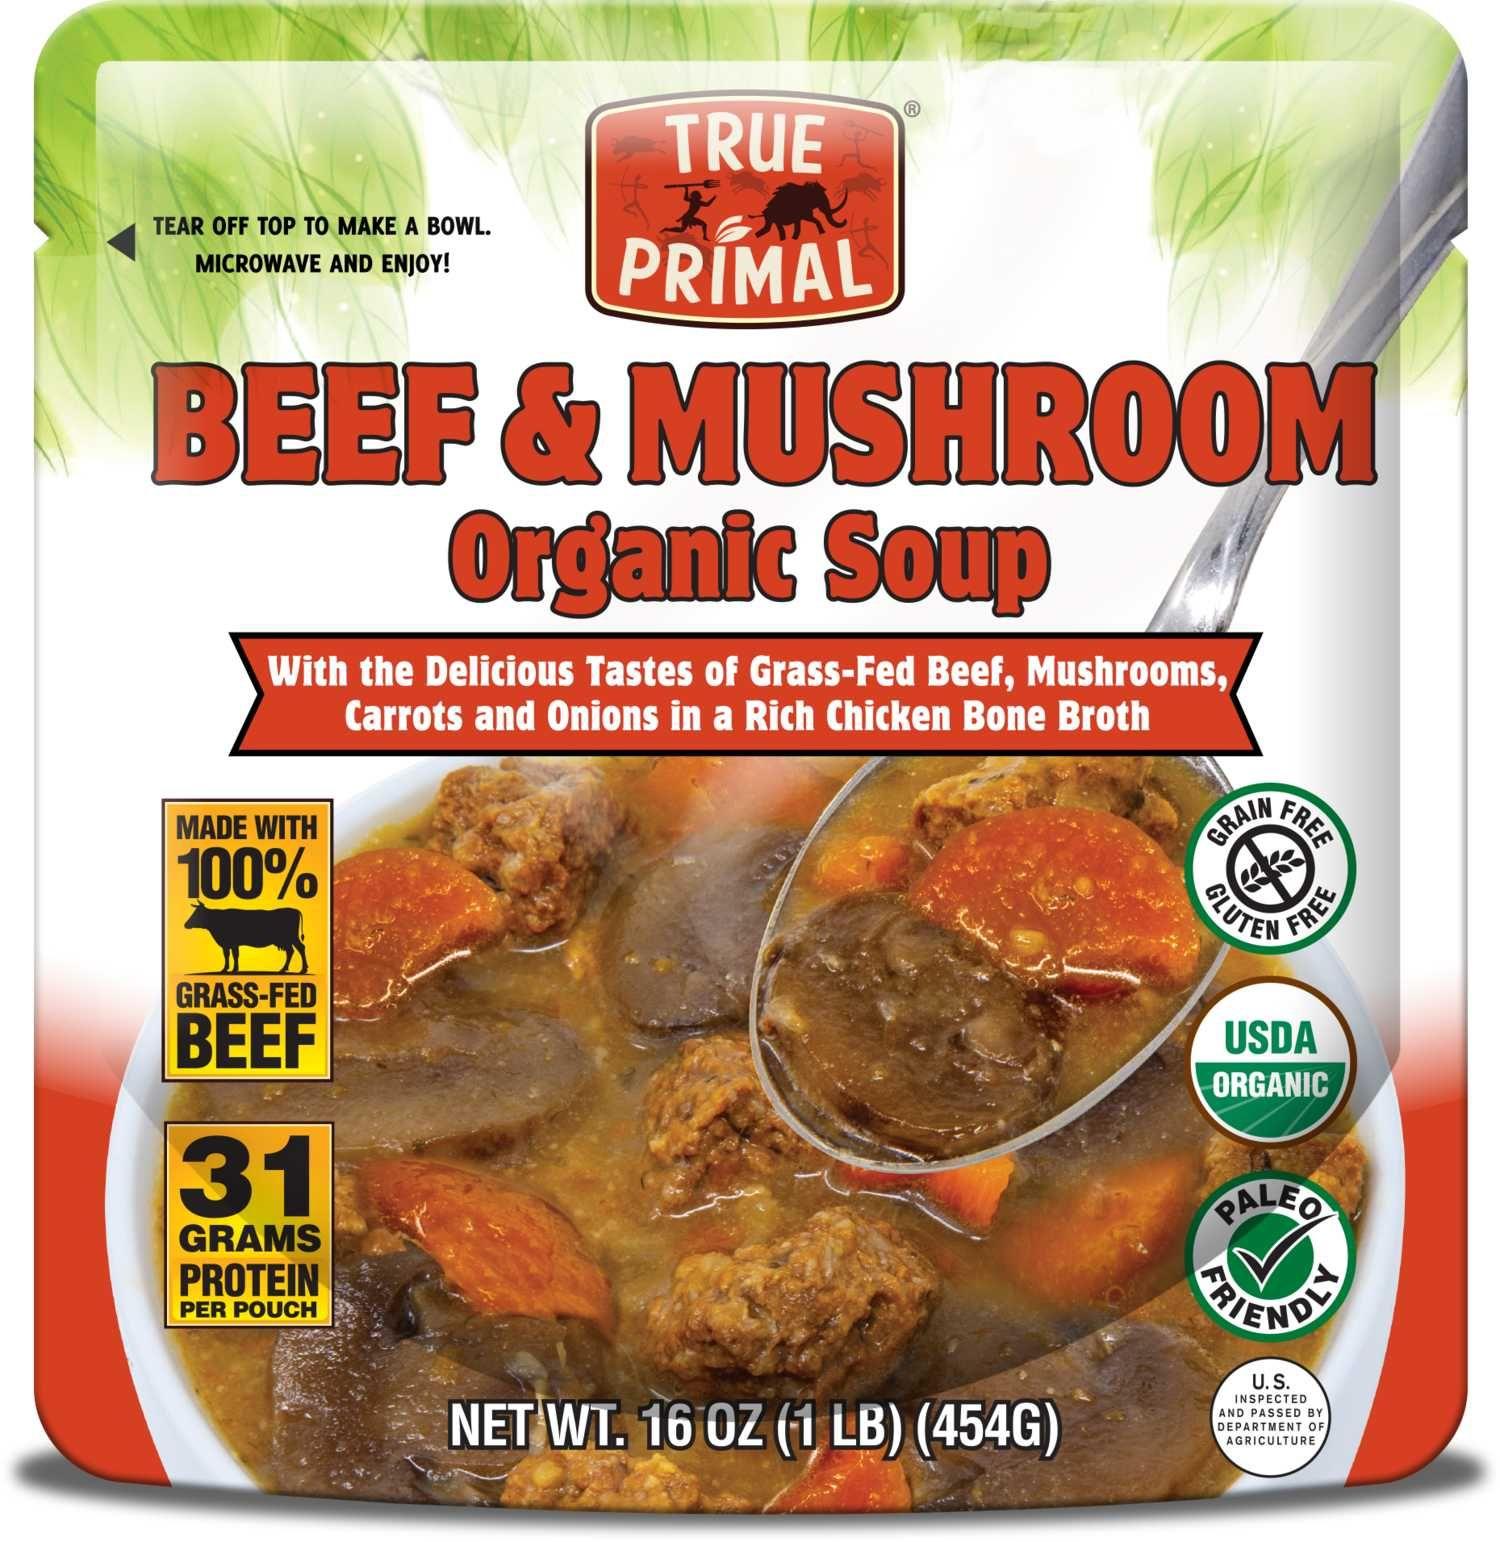 Beef & Mushroom Organic Soup Organic soup, Stuffed